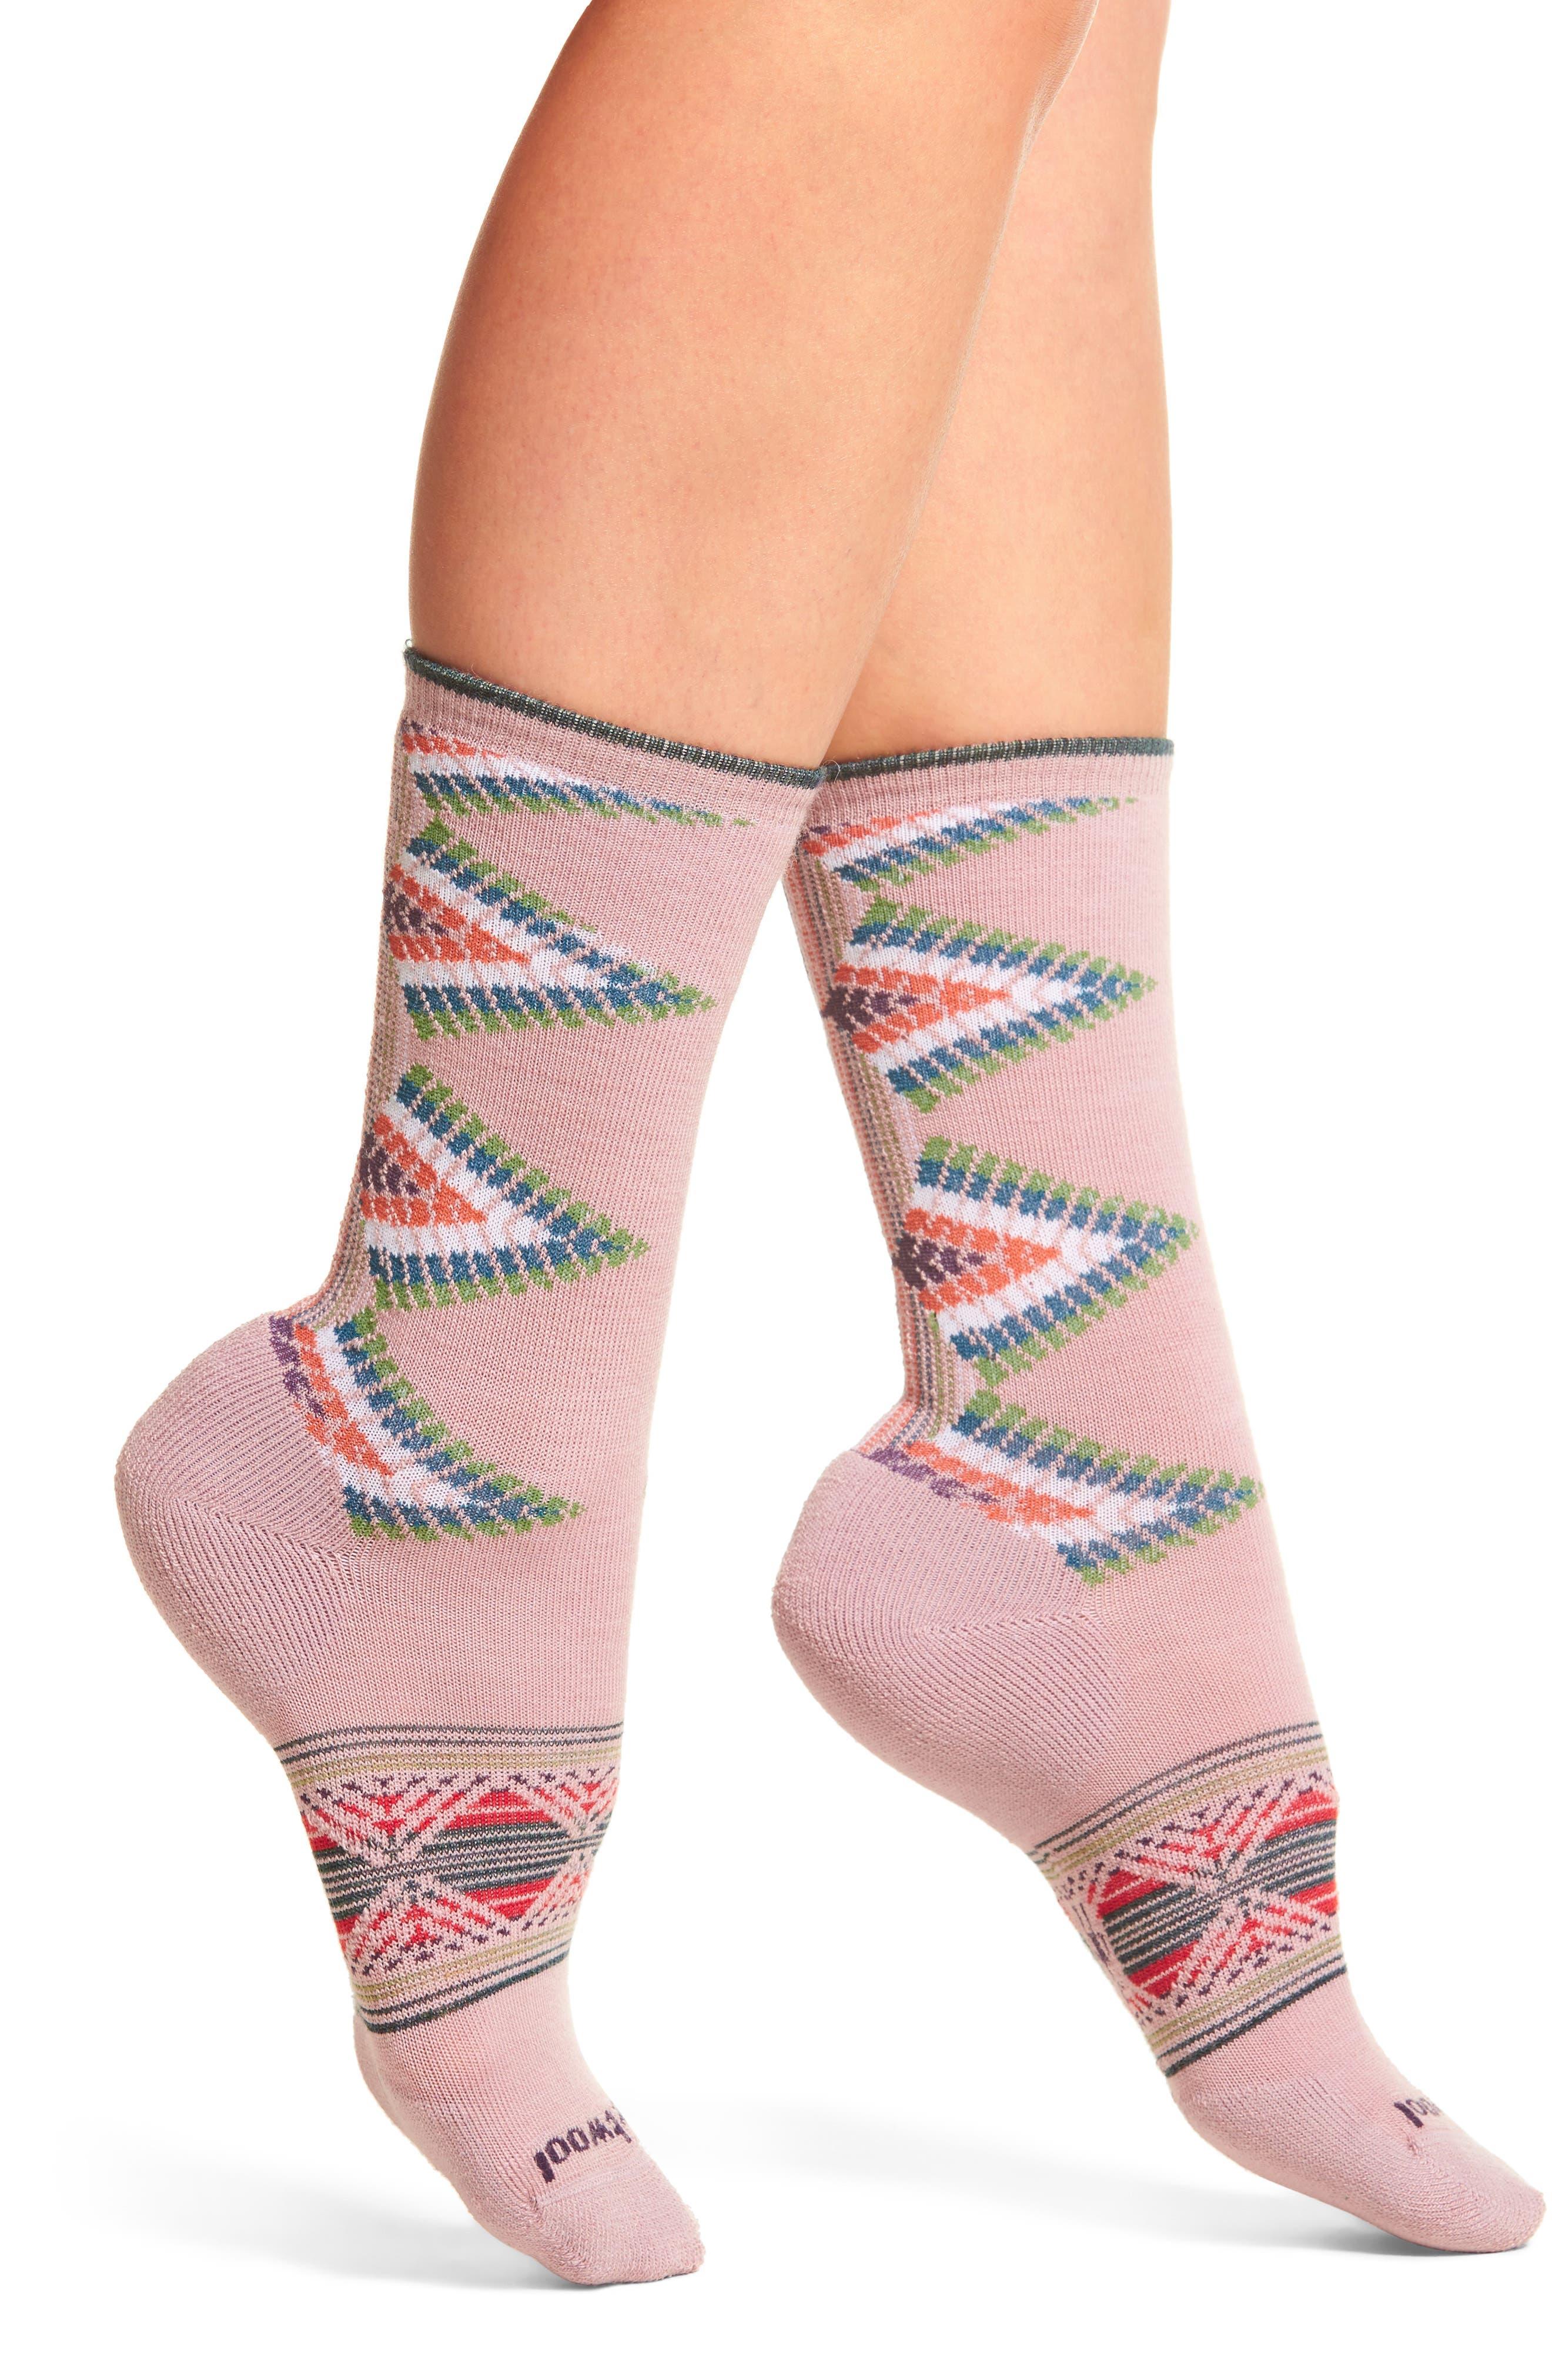 Tiva Crew Socks,                             Main thumbnail 1, color,                             650